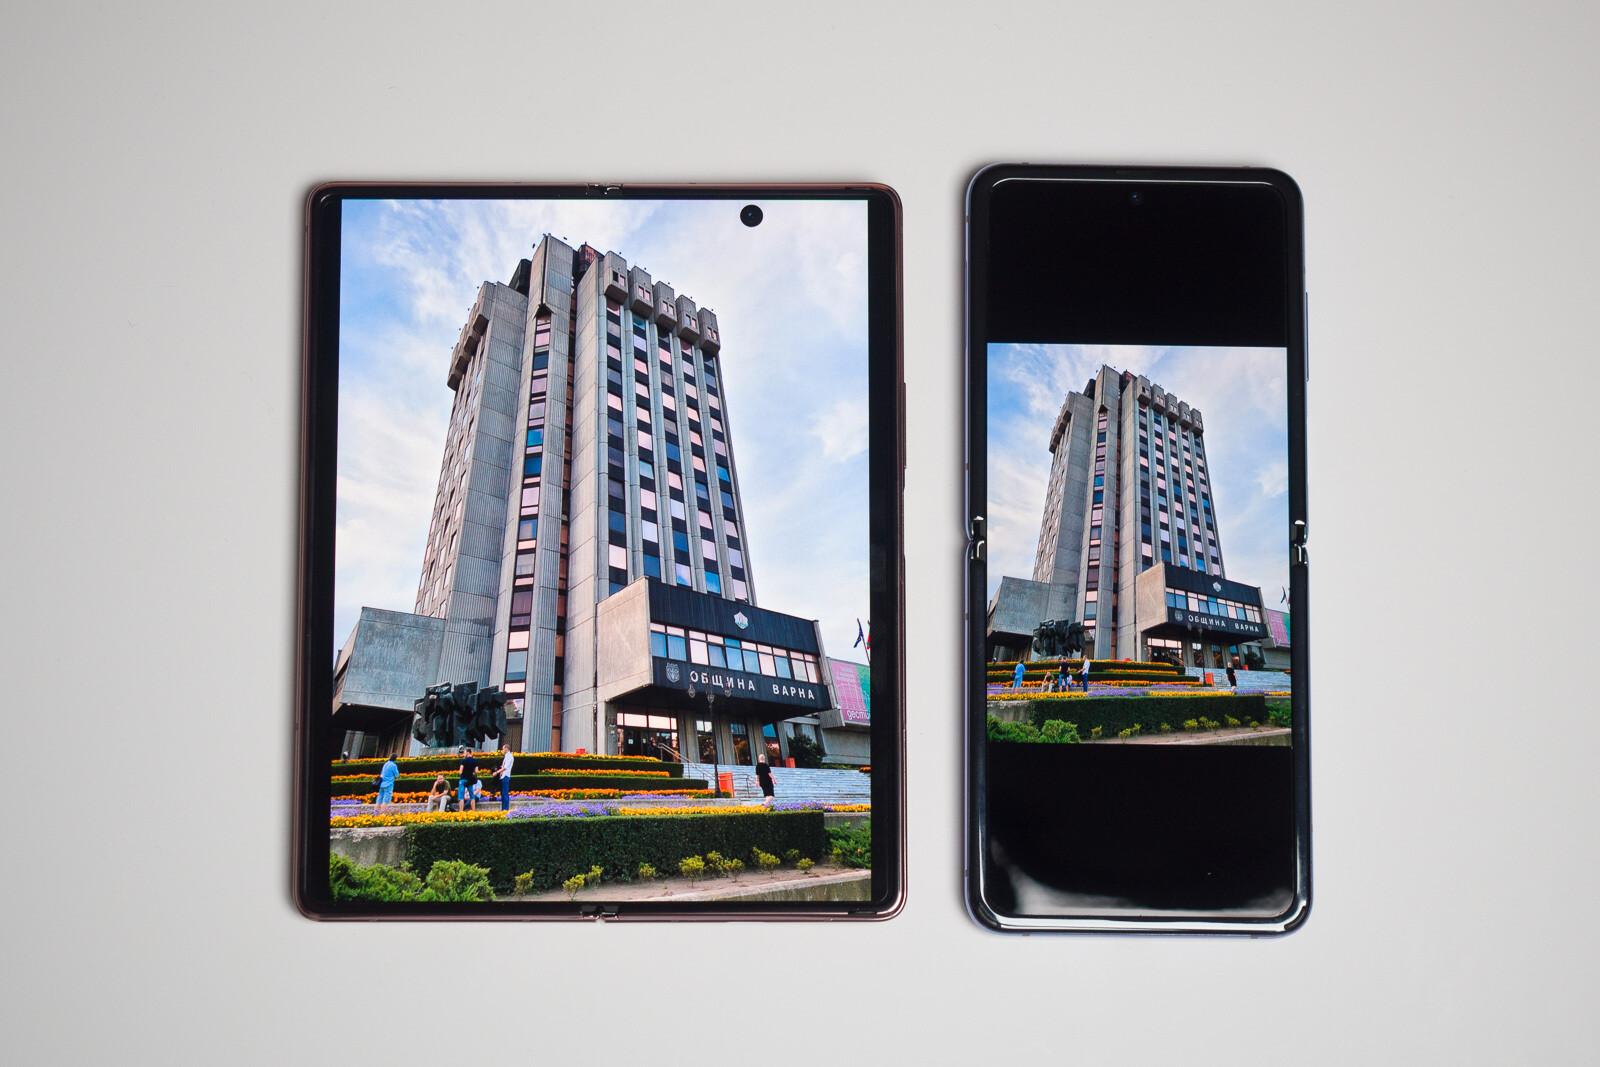 Samsung Galaxy Z Fold 2 vs Samsung Galaxy Z Flip: a battle of Samsung foldables